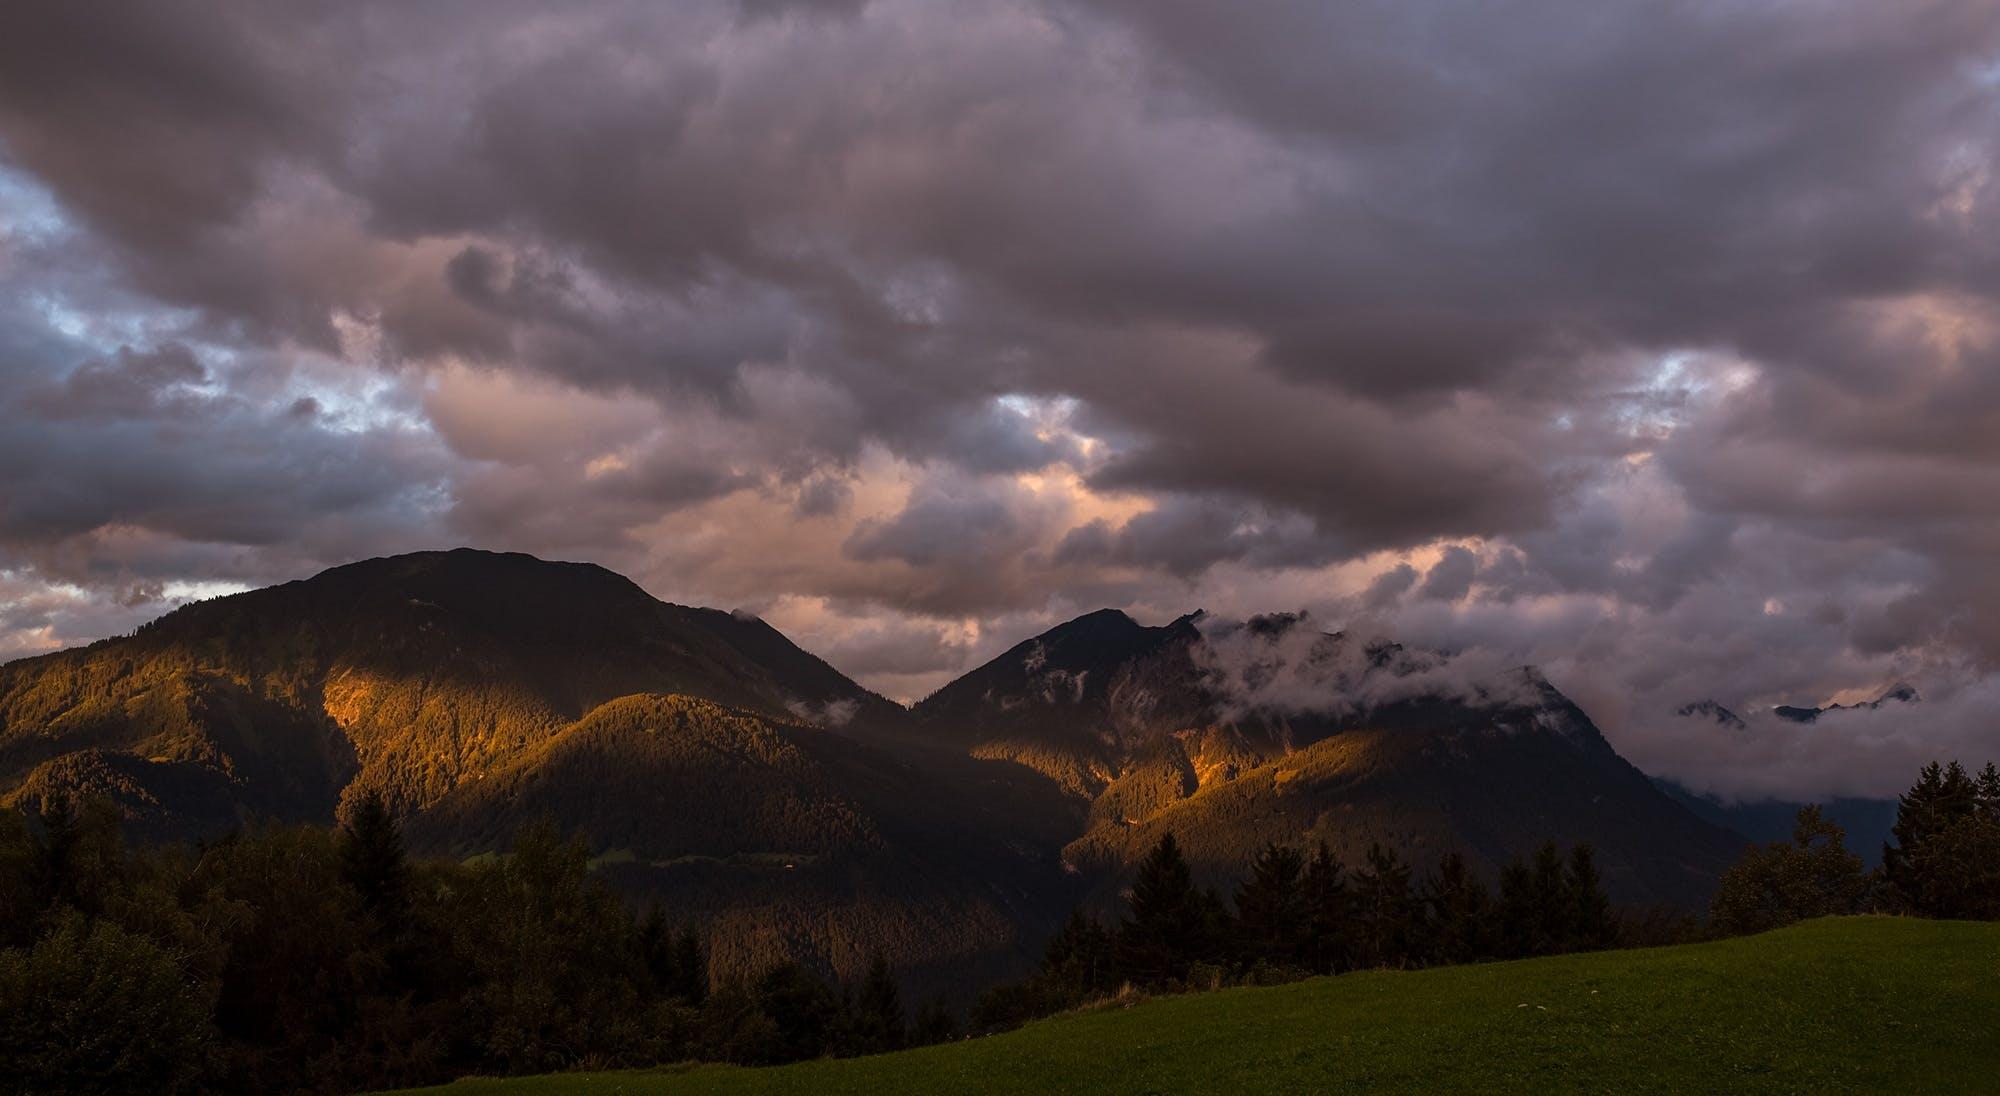 clouds, dawn, daylight